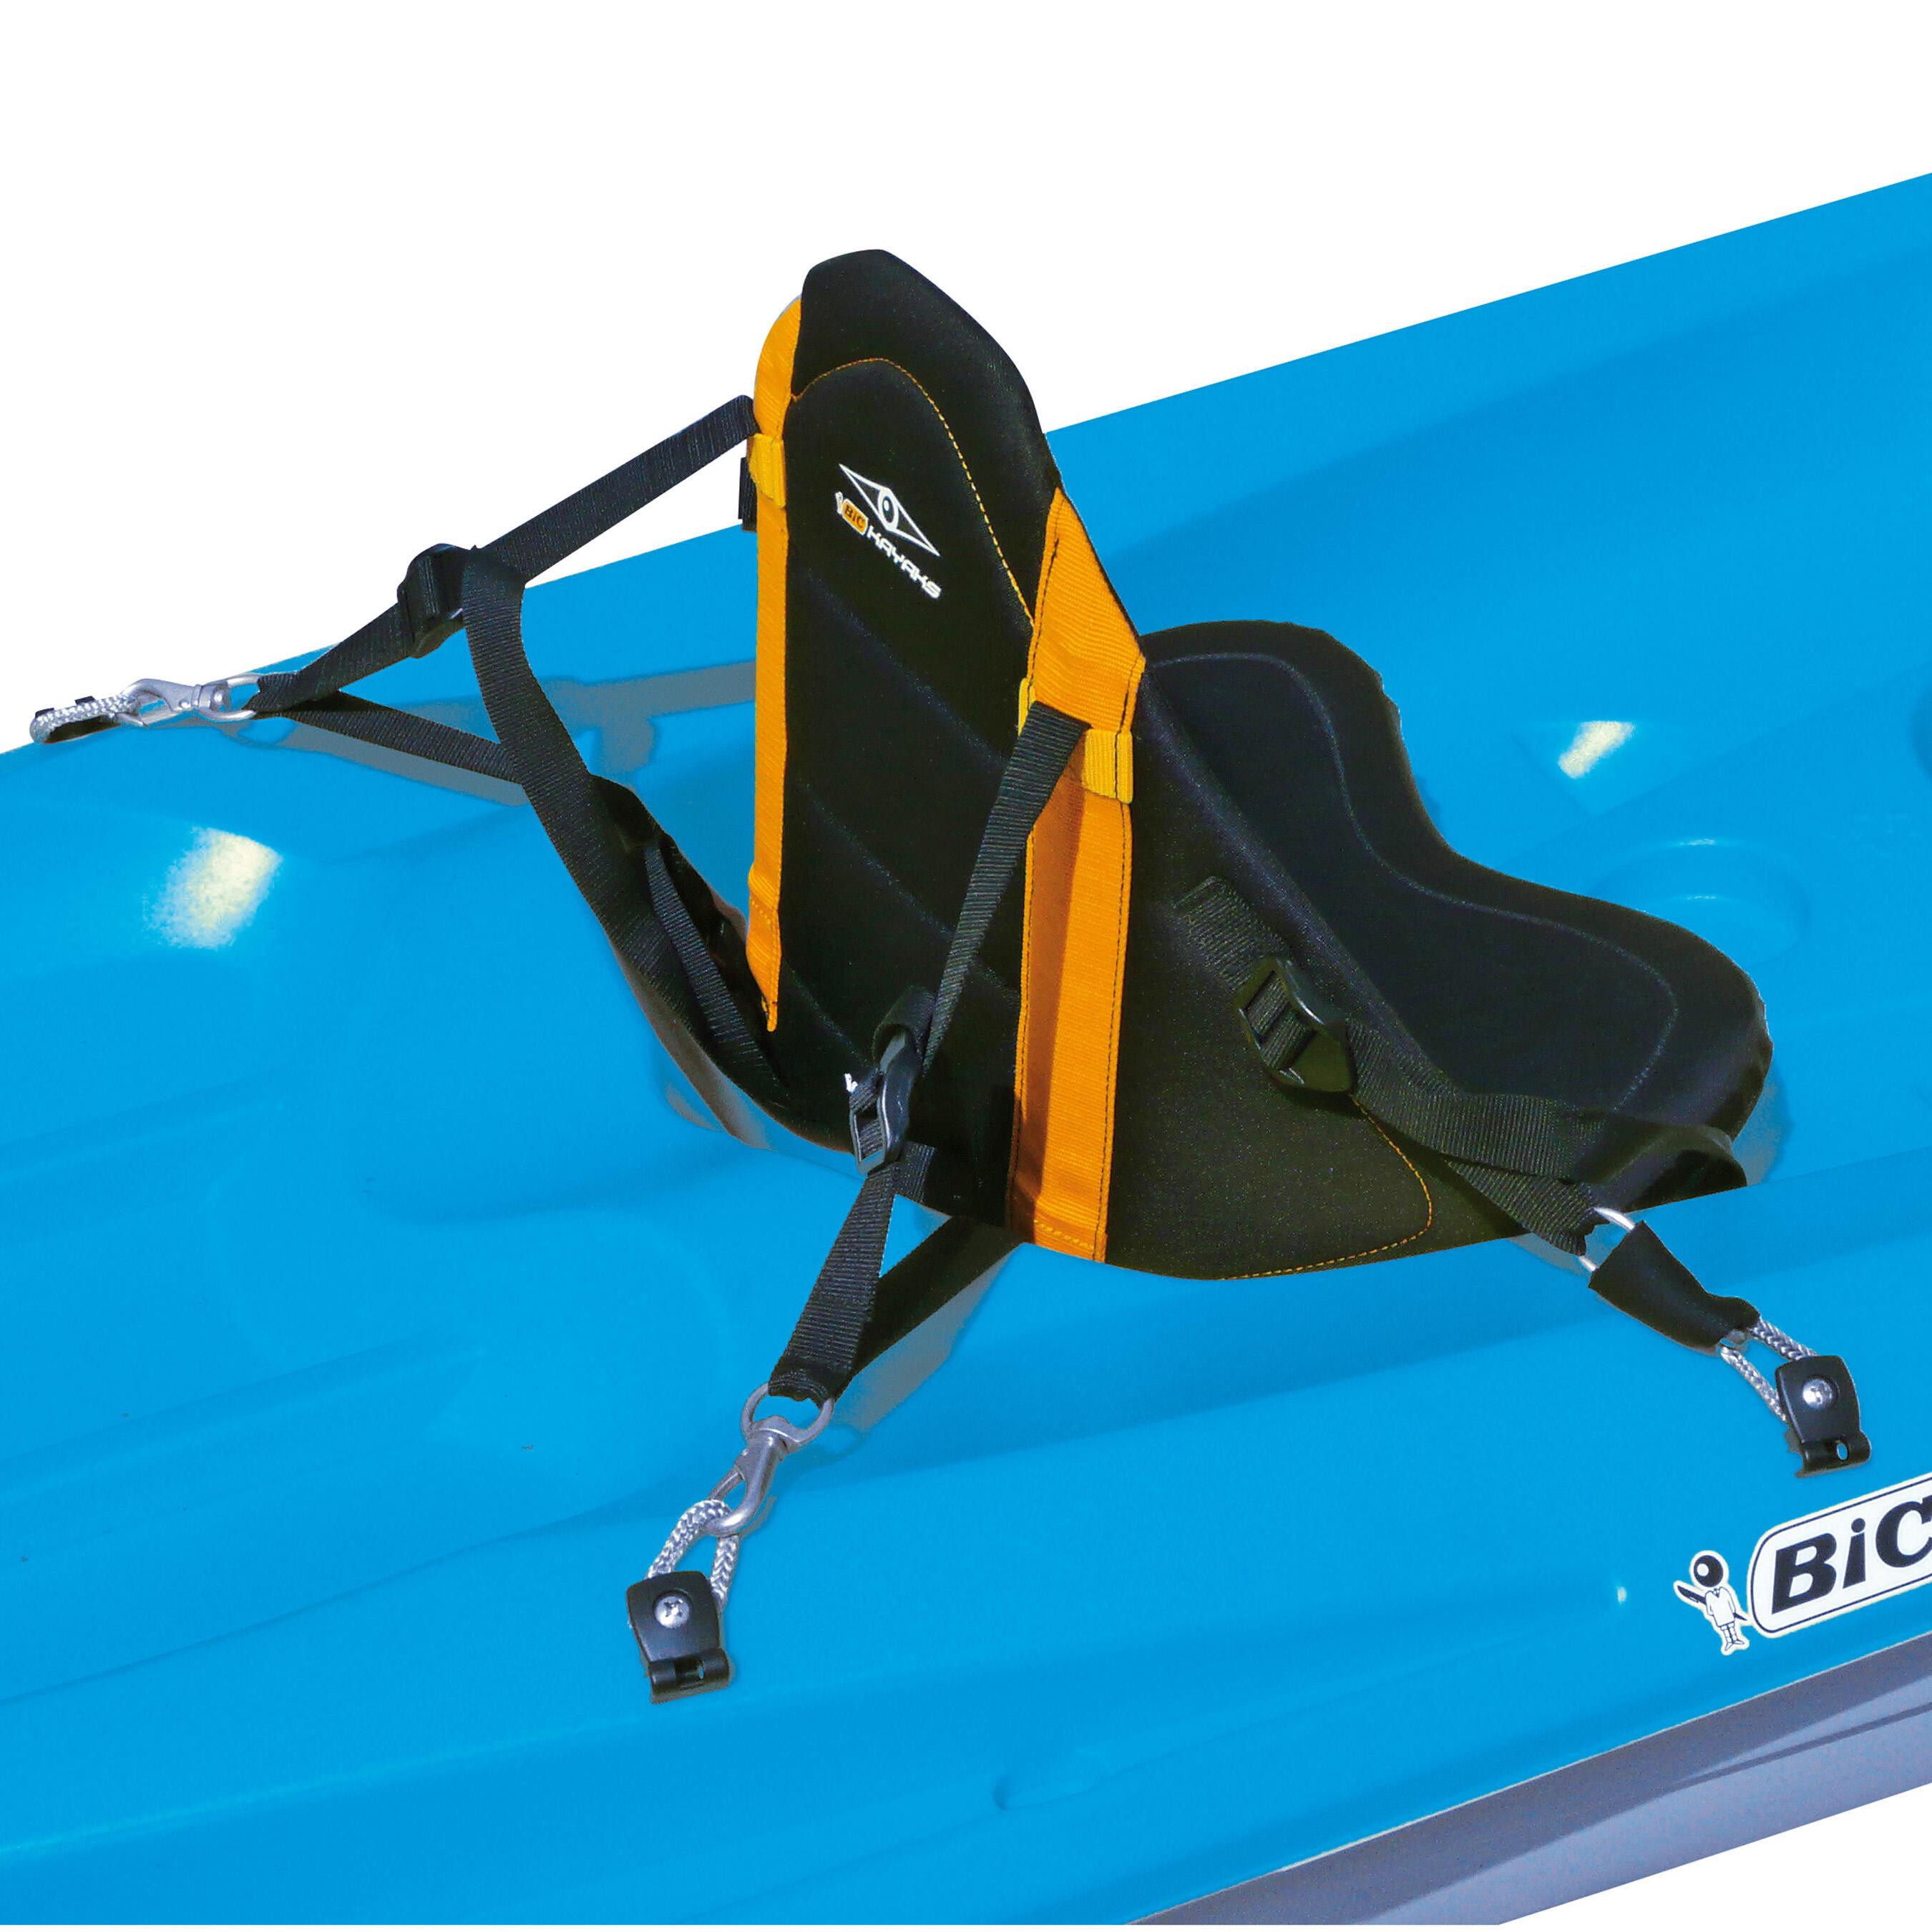 bic kayaks standaard rugsteun voor kajak. Black Bedroom Furniture Sets. Home Design Ideas